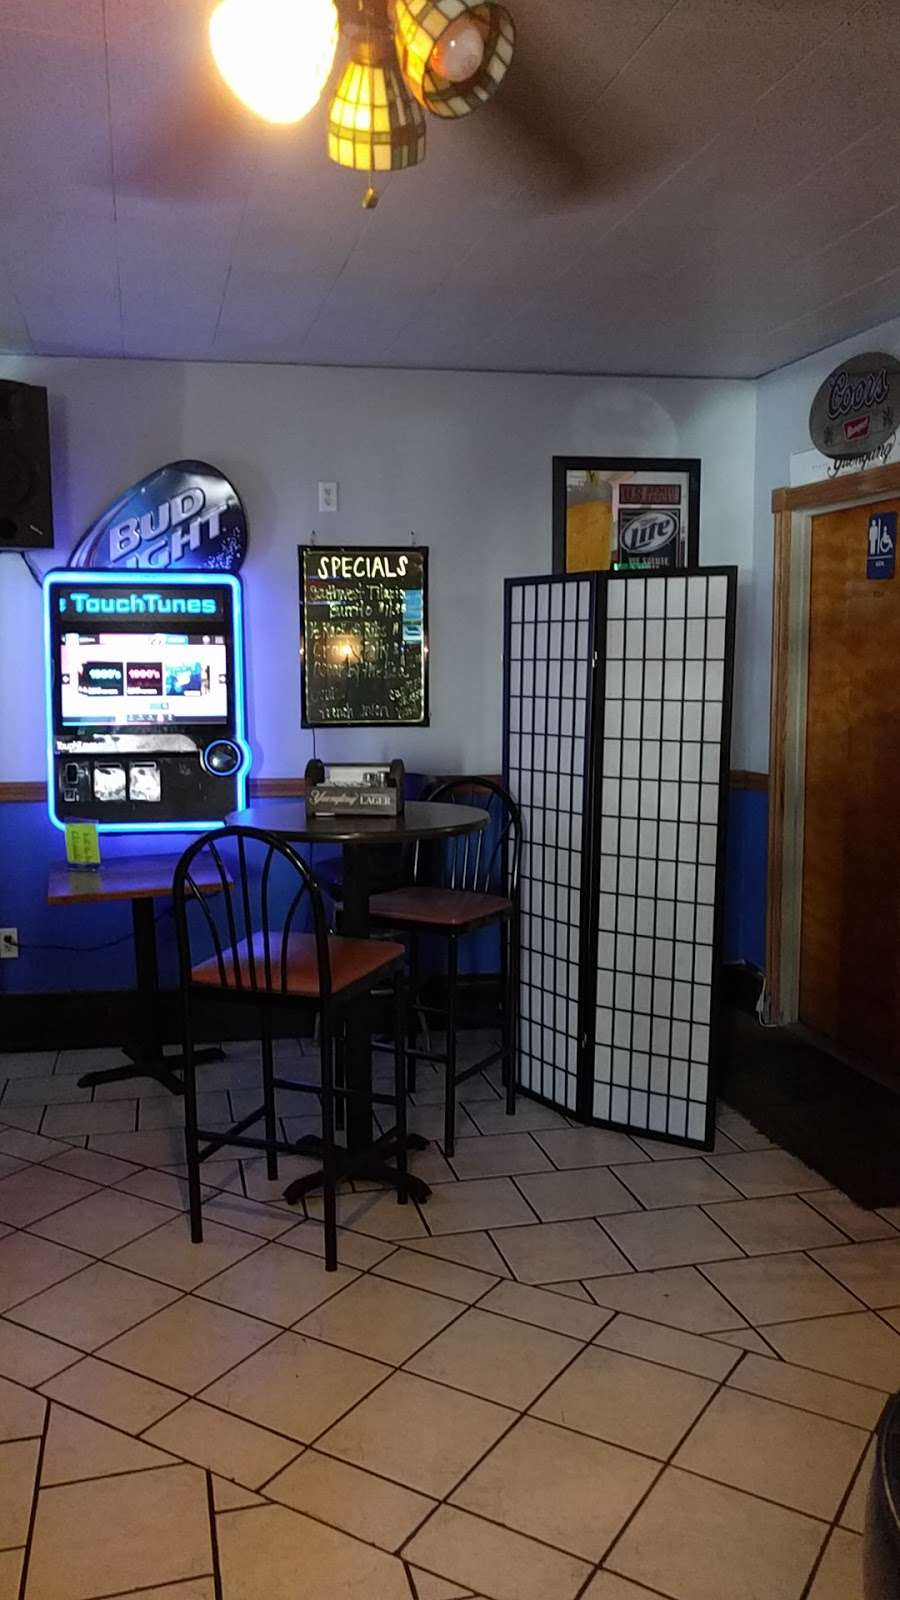 Yockos - restaurant  | Photo 4 of 7 | Address: 18 N Delaware Ave, Minersville, PA 17954, USA | Phone: (570) 544-5442